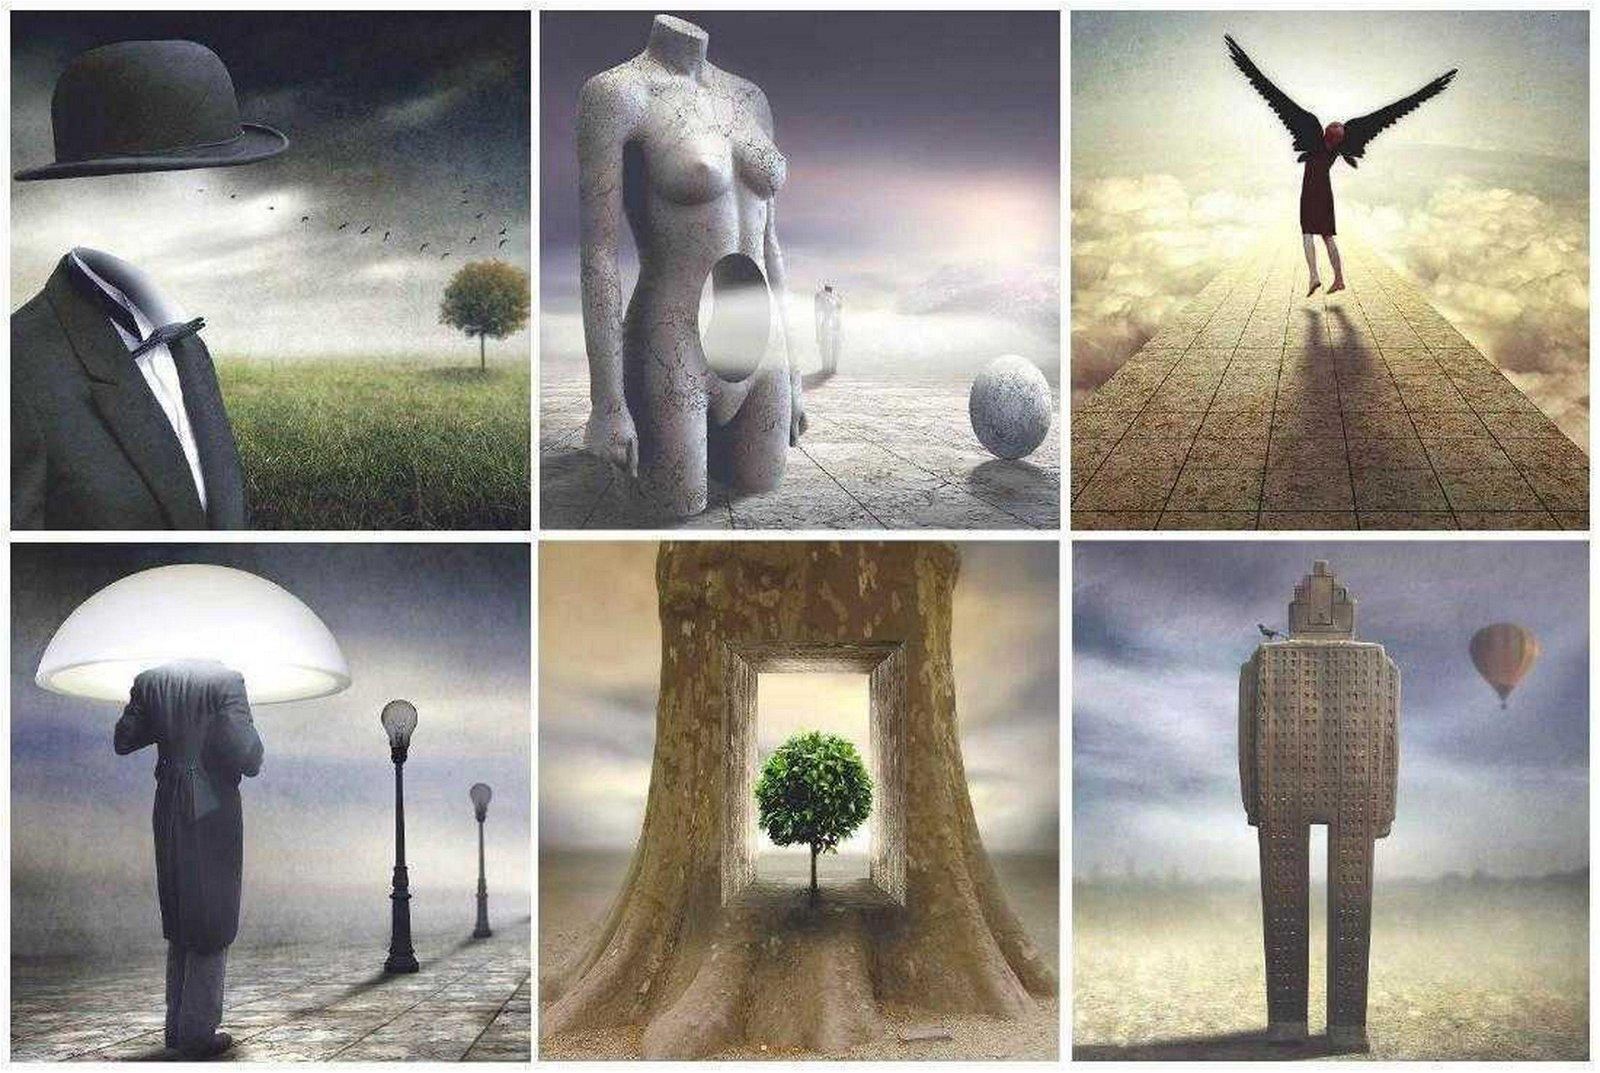 Ben Goossens - In the Footsteps of Magritte